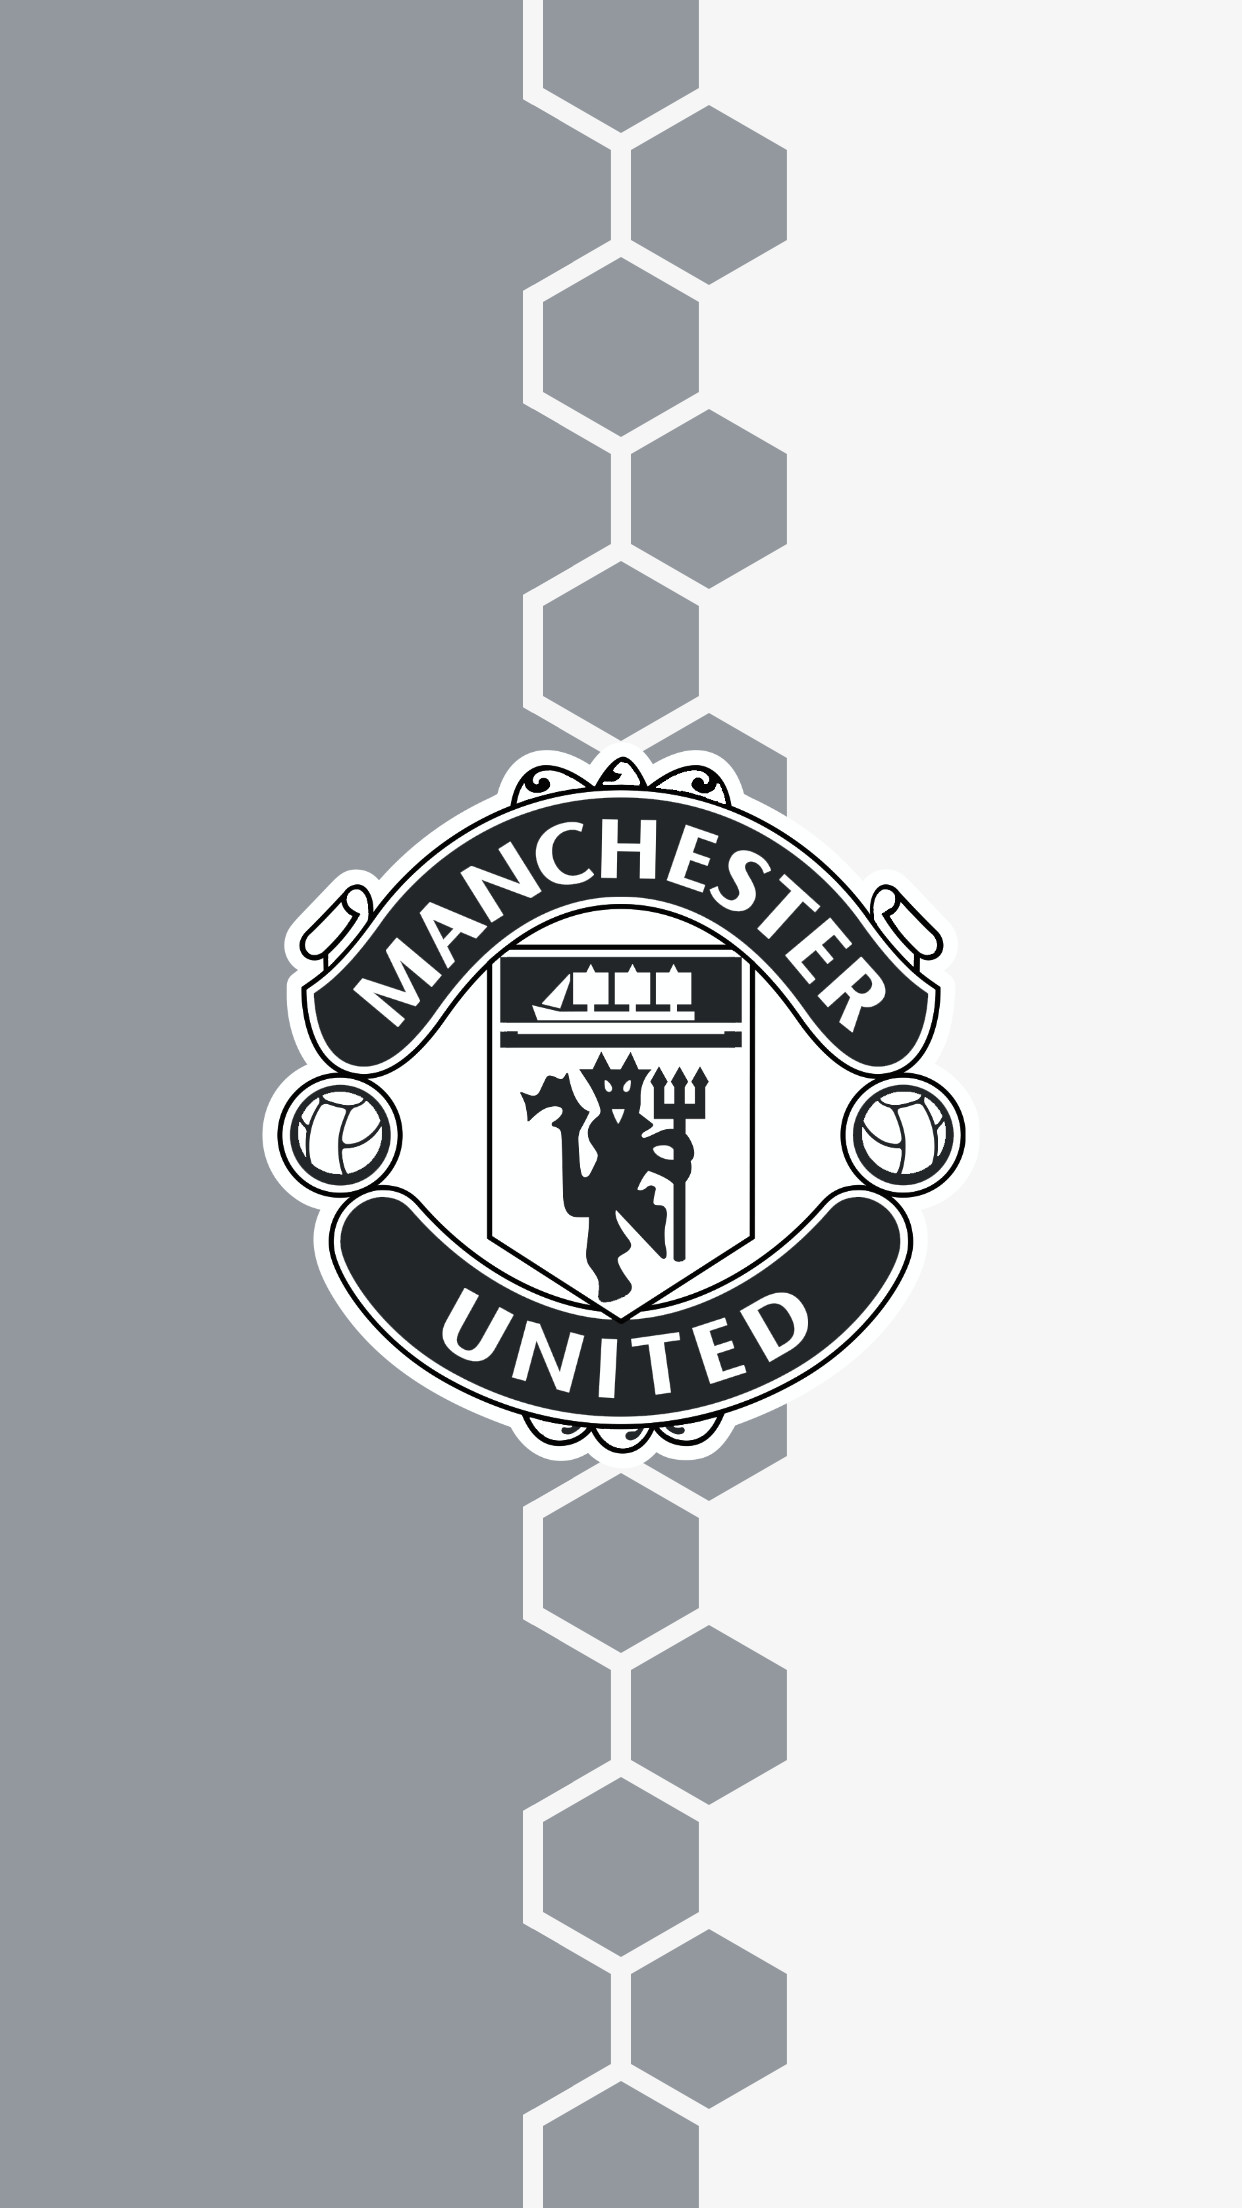 Football Pictures, Man United, Mobile Wallpaper, Premier League, Ronaldo, Manchester  United, Basil, Fifa, Tokyo